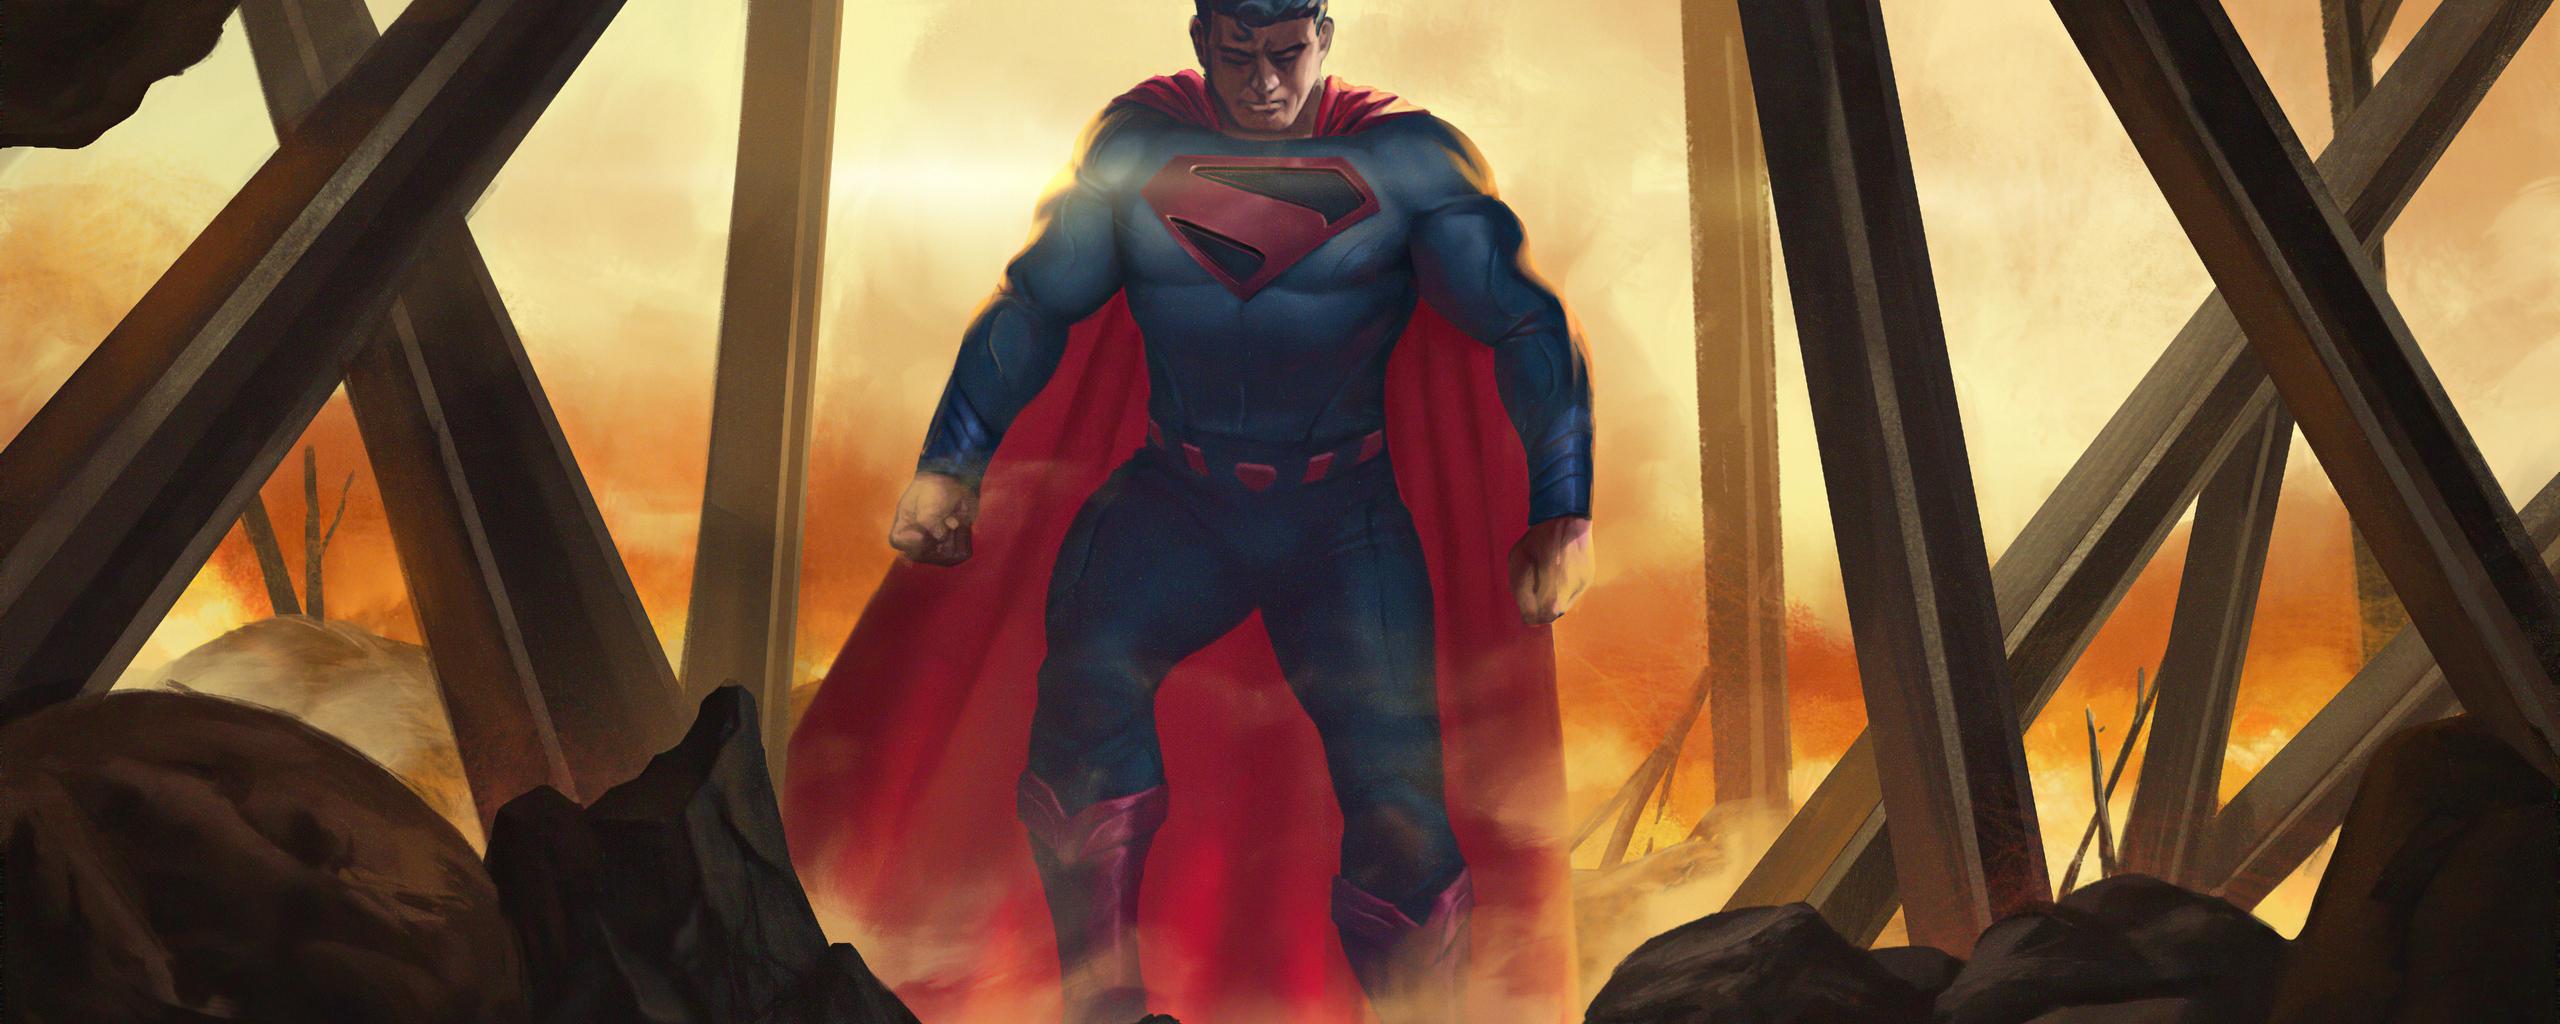 superman-new-49.jpg